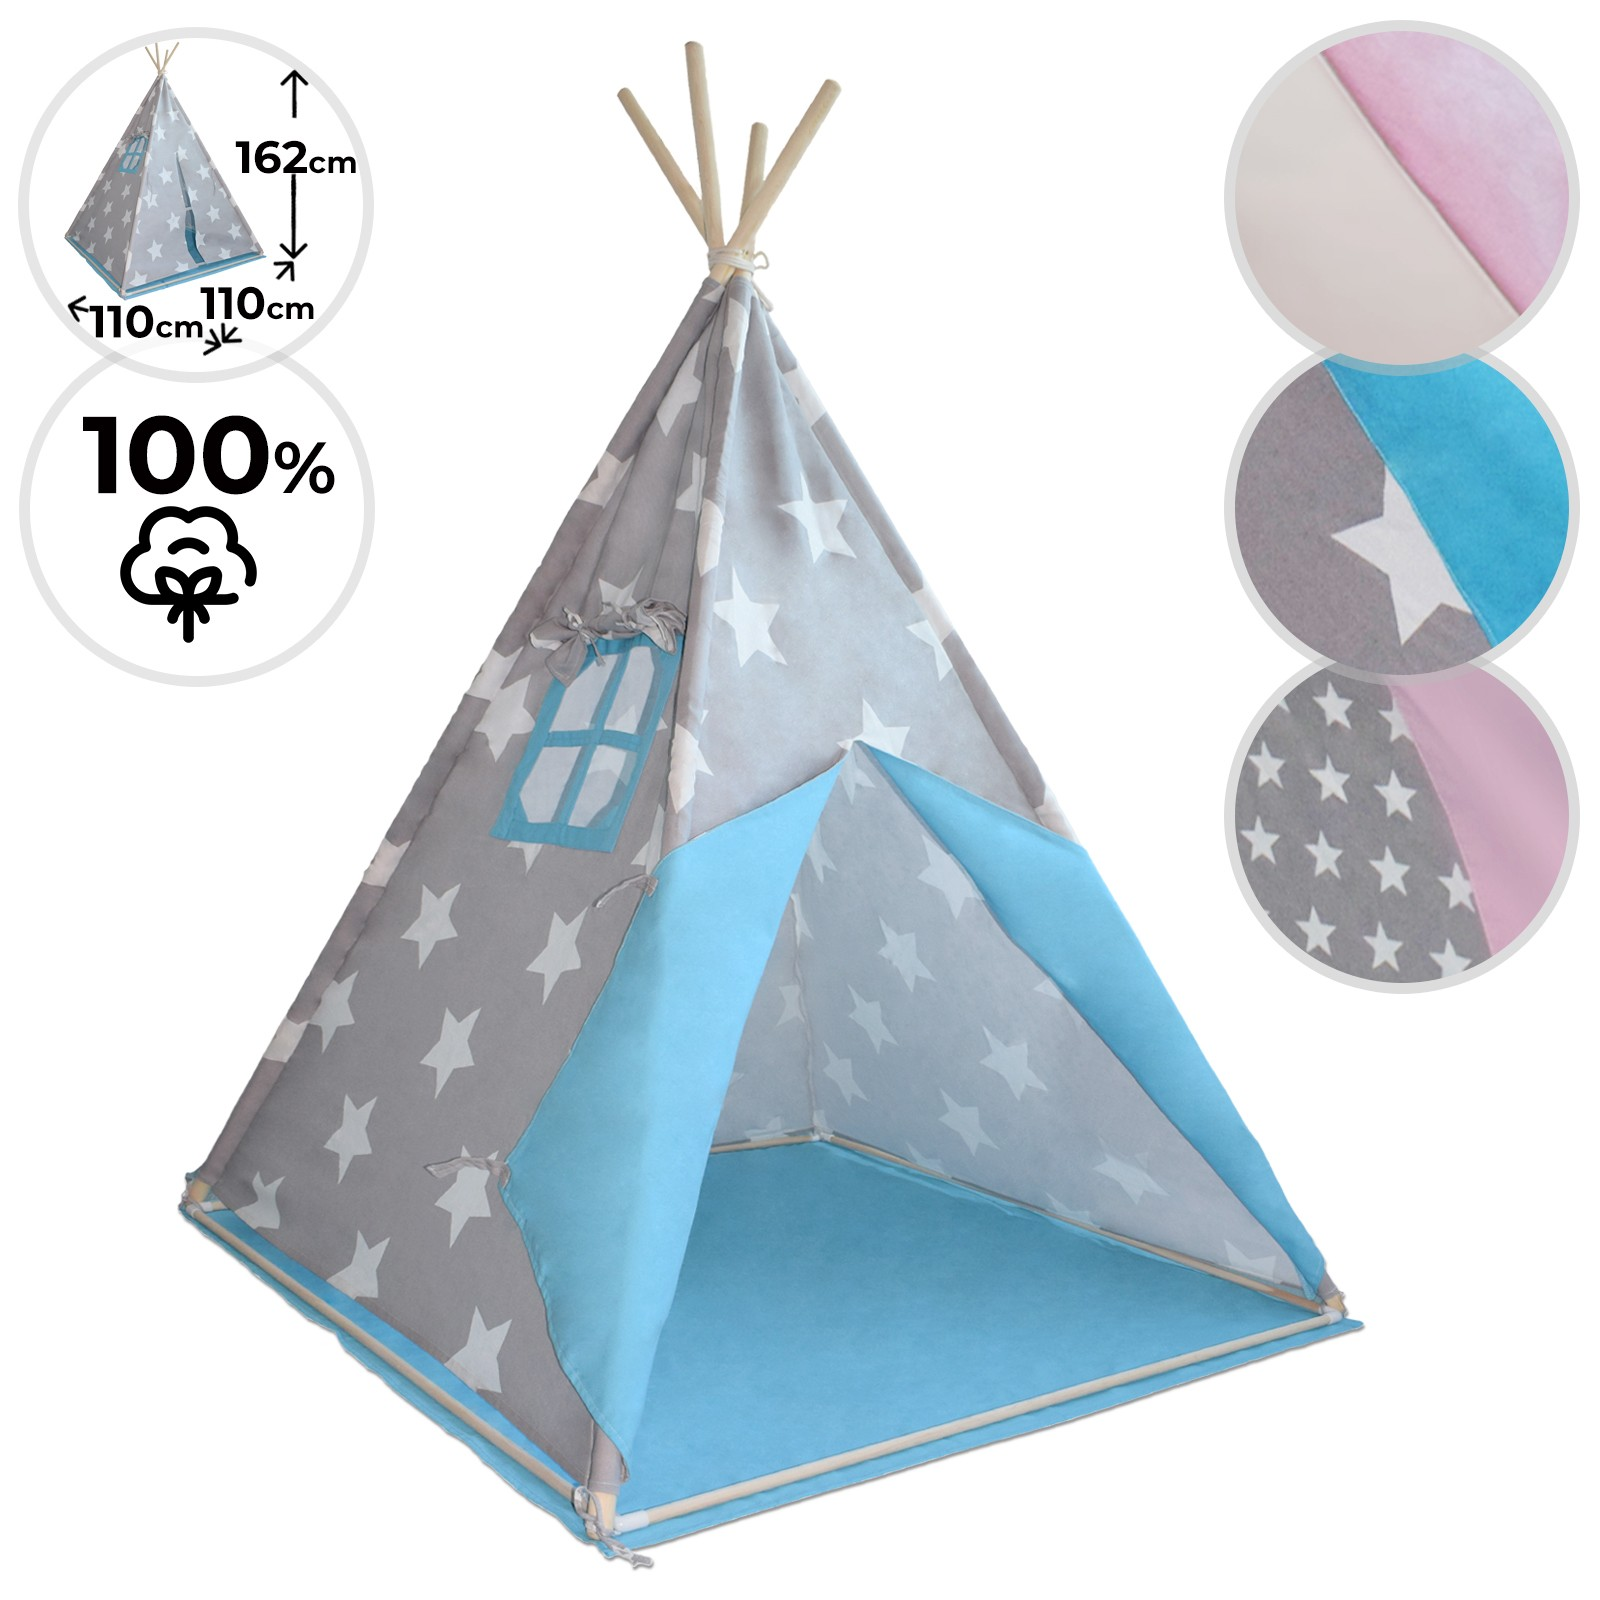 Tenda Indiani Fai Da Te dettagli su tenda teepee indiana e amaca per bambini da gioco nido altalena  sospesa cotone